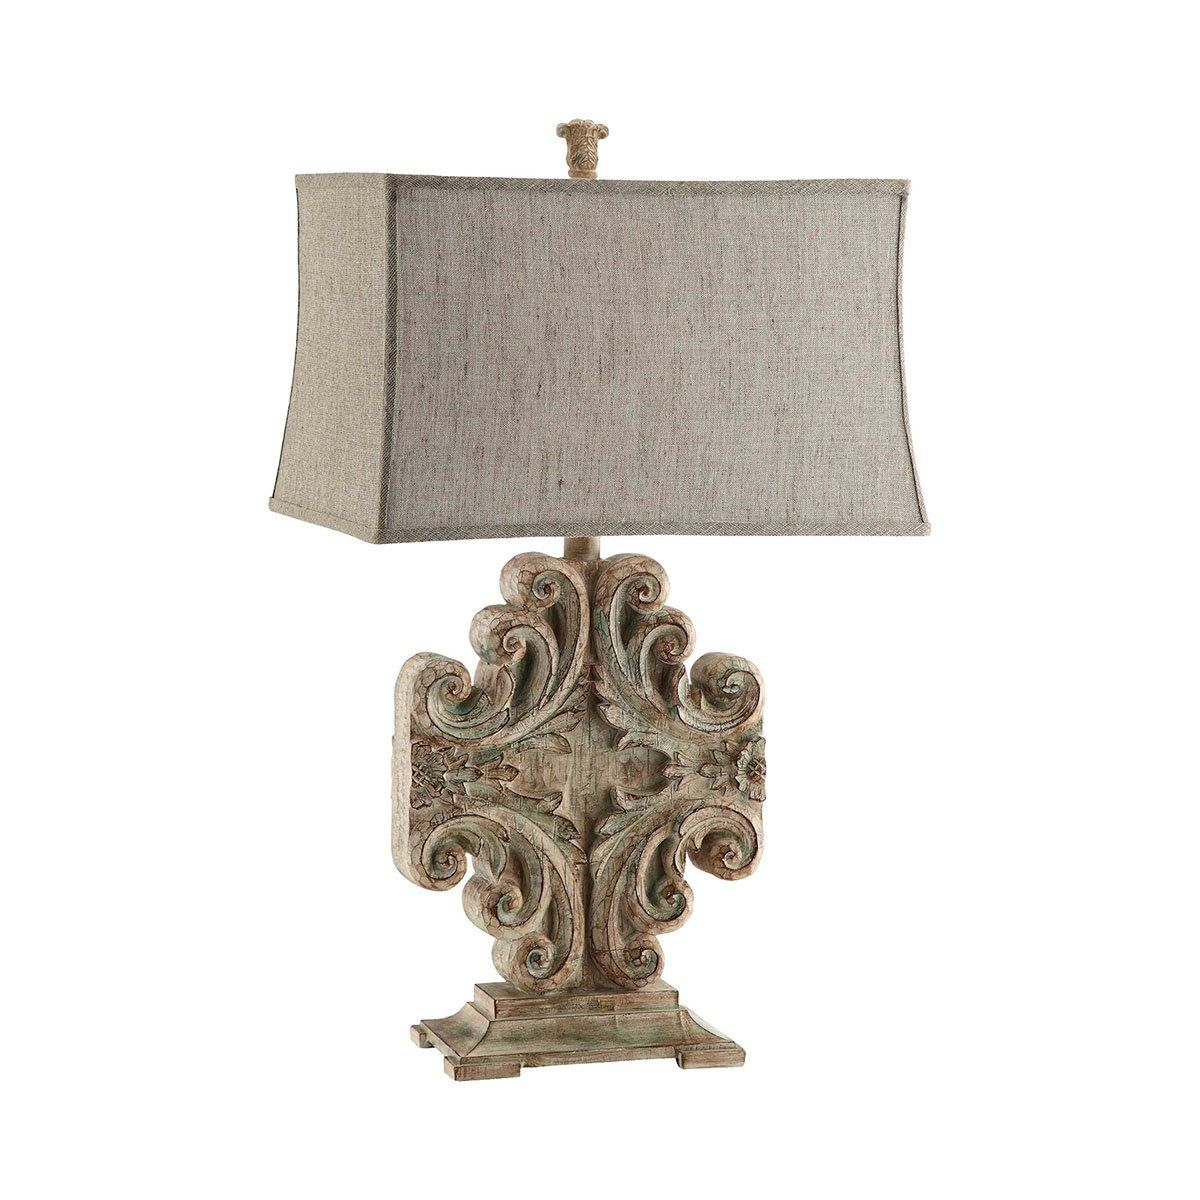 vintage carved pattern resin table lamp in driftwood like finish rh pinterest com